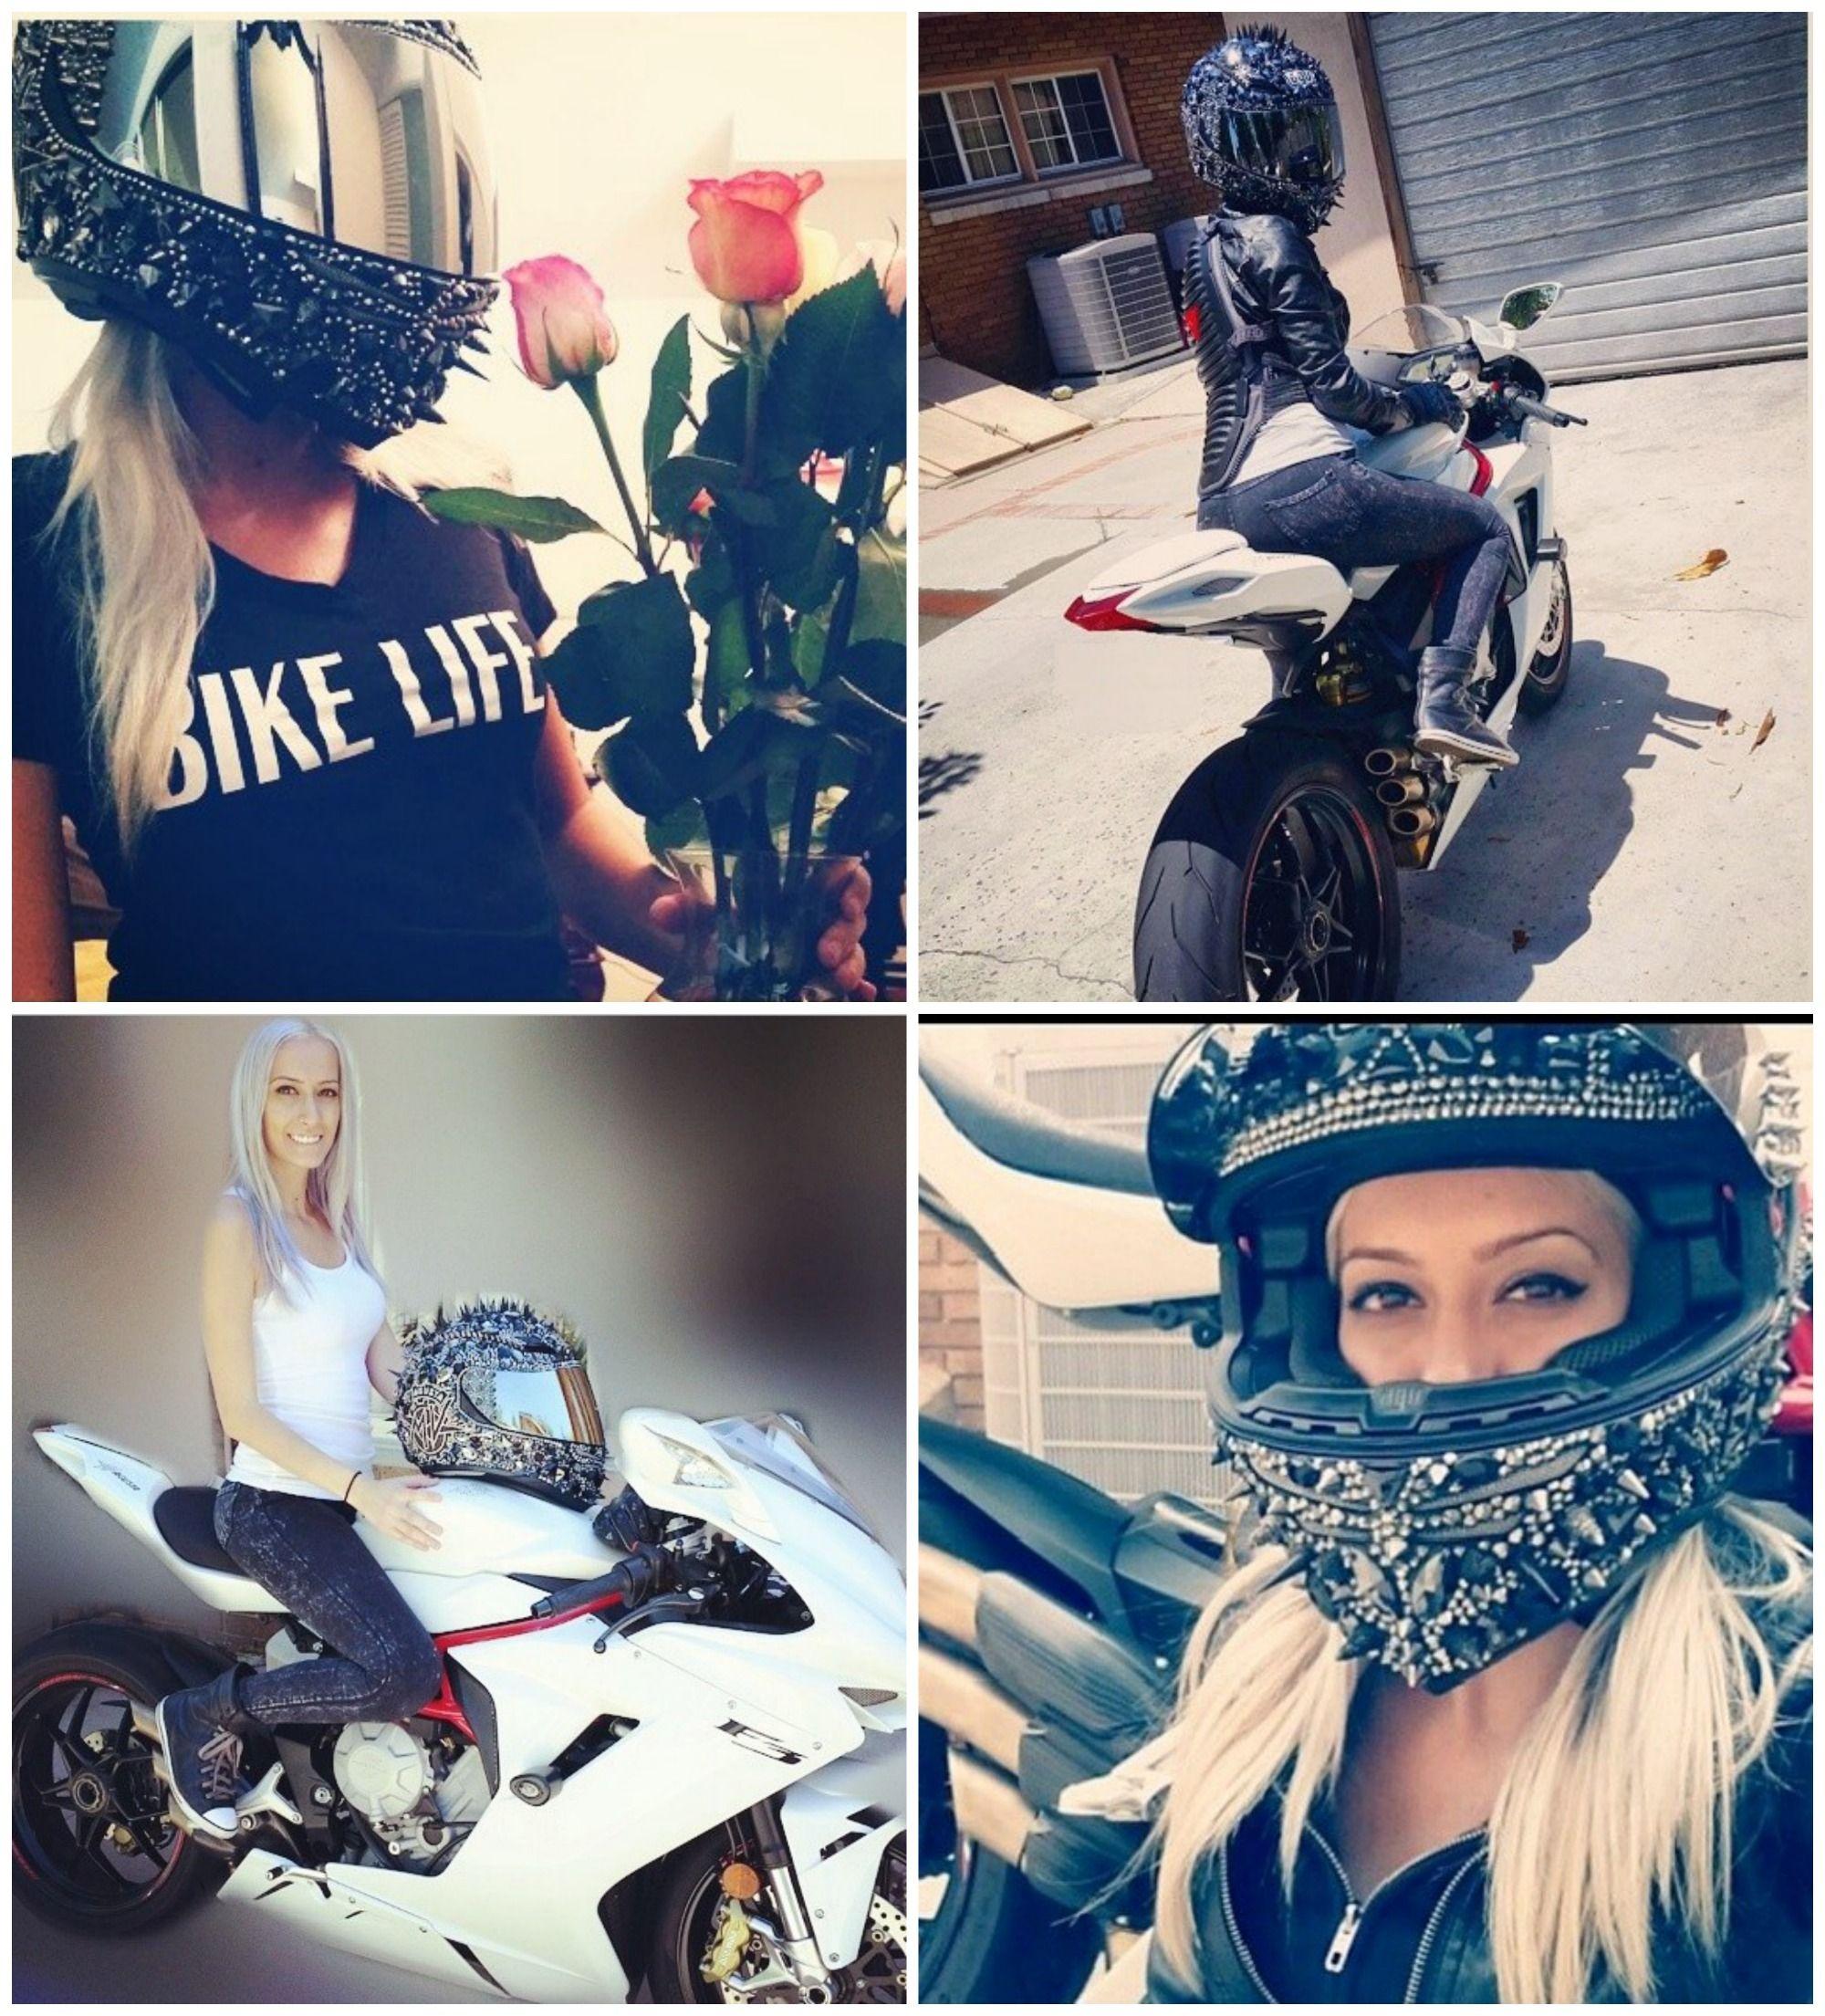 Crystal and spike helmet collage from @bikerdee